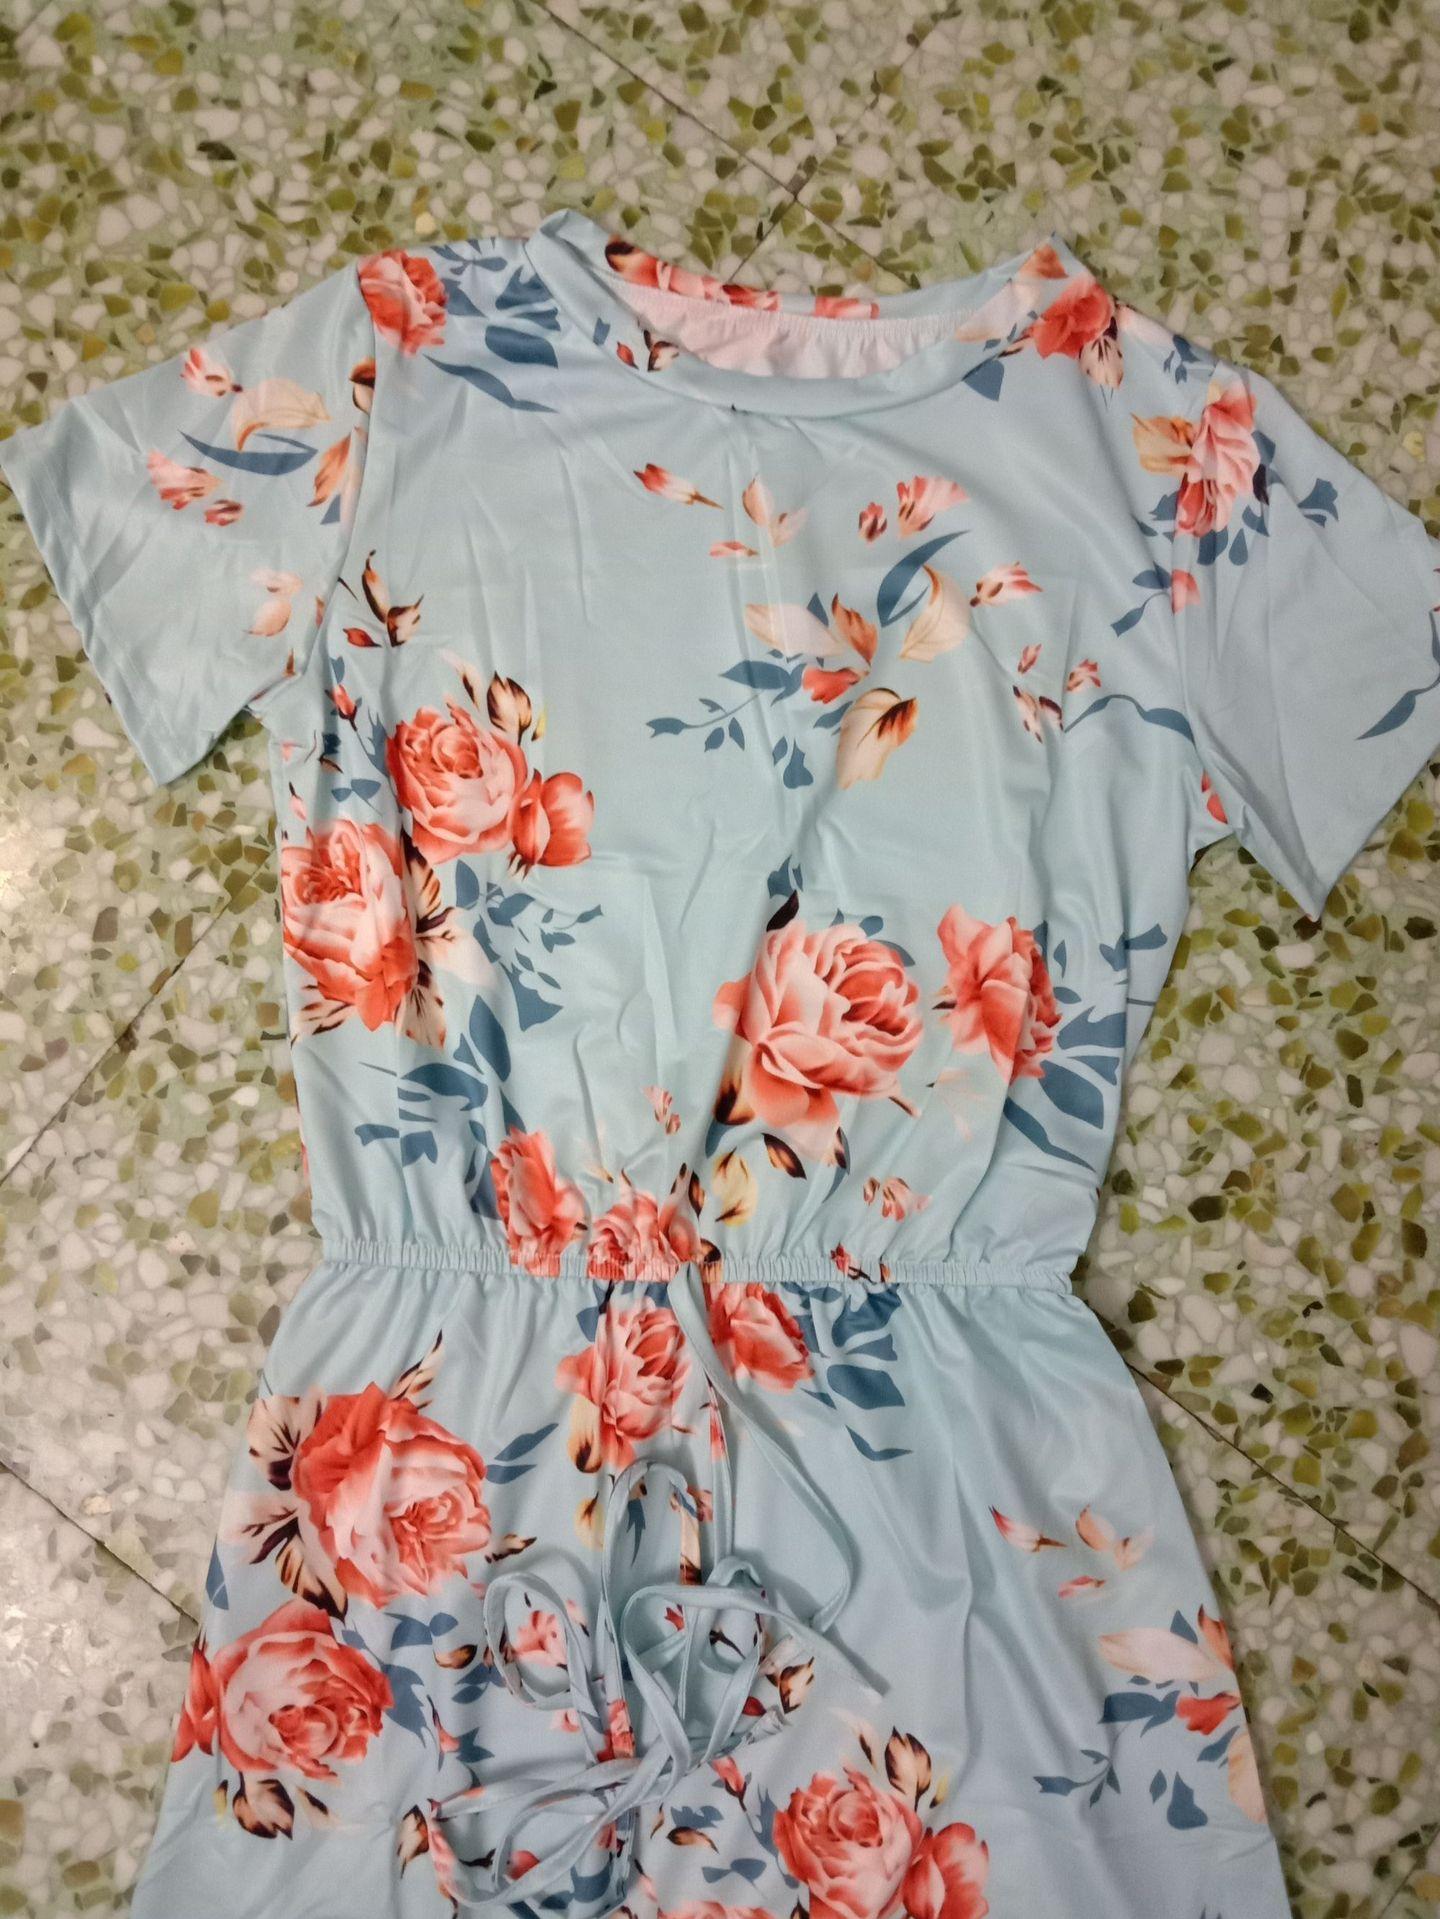 ladies fashion new printed bouquet waist short sleeve round neck dress NSYF1139